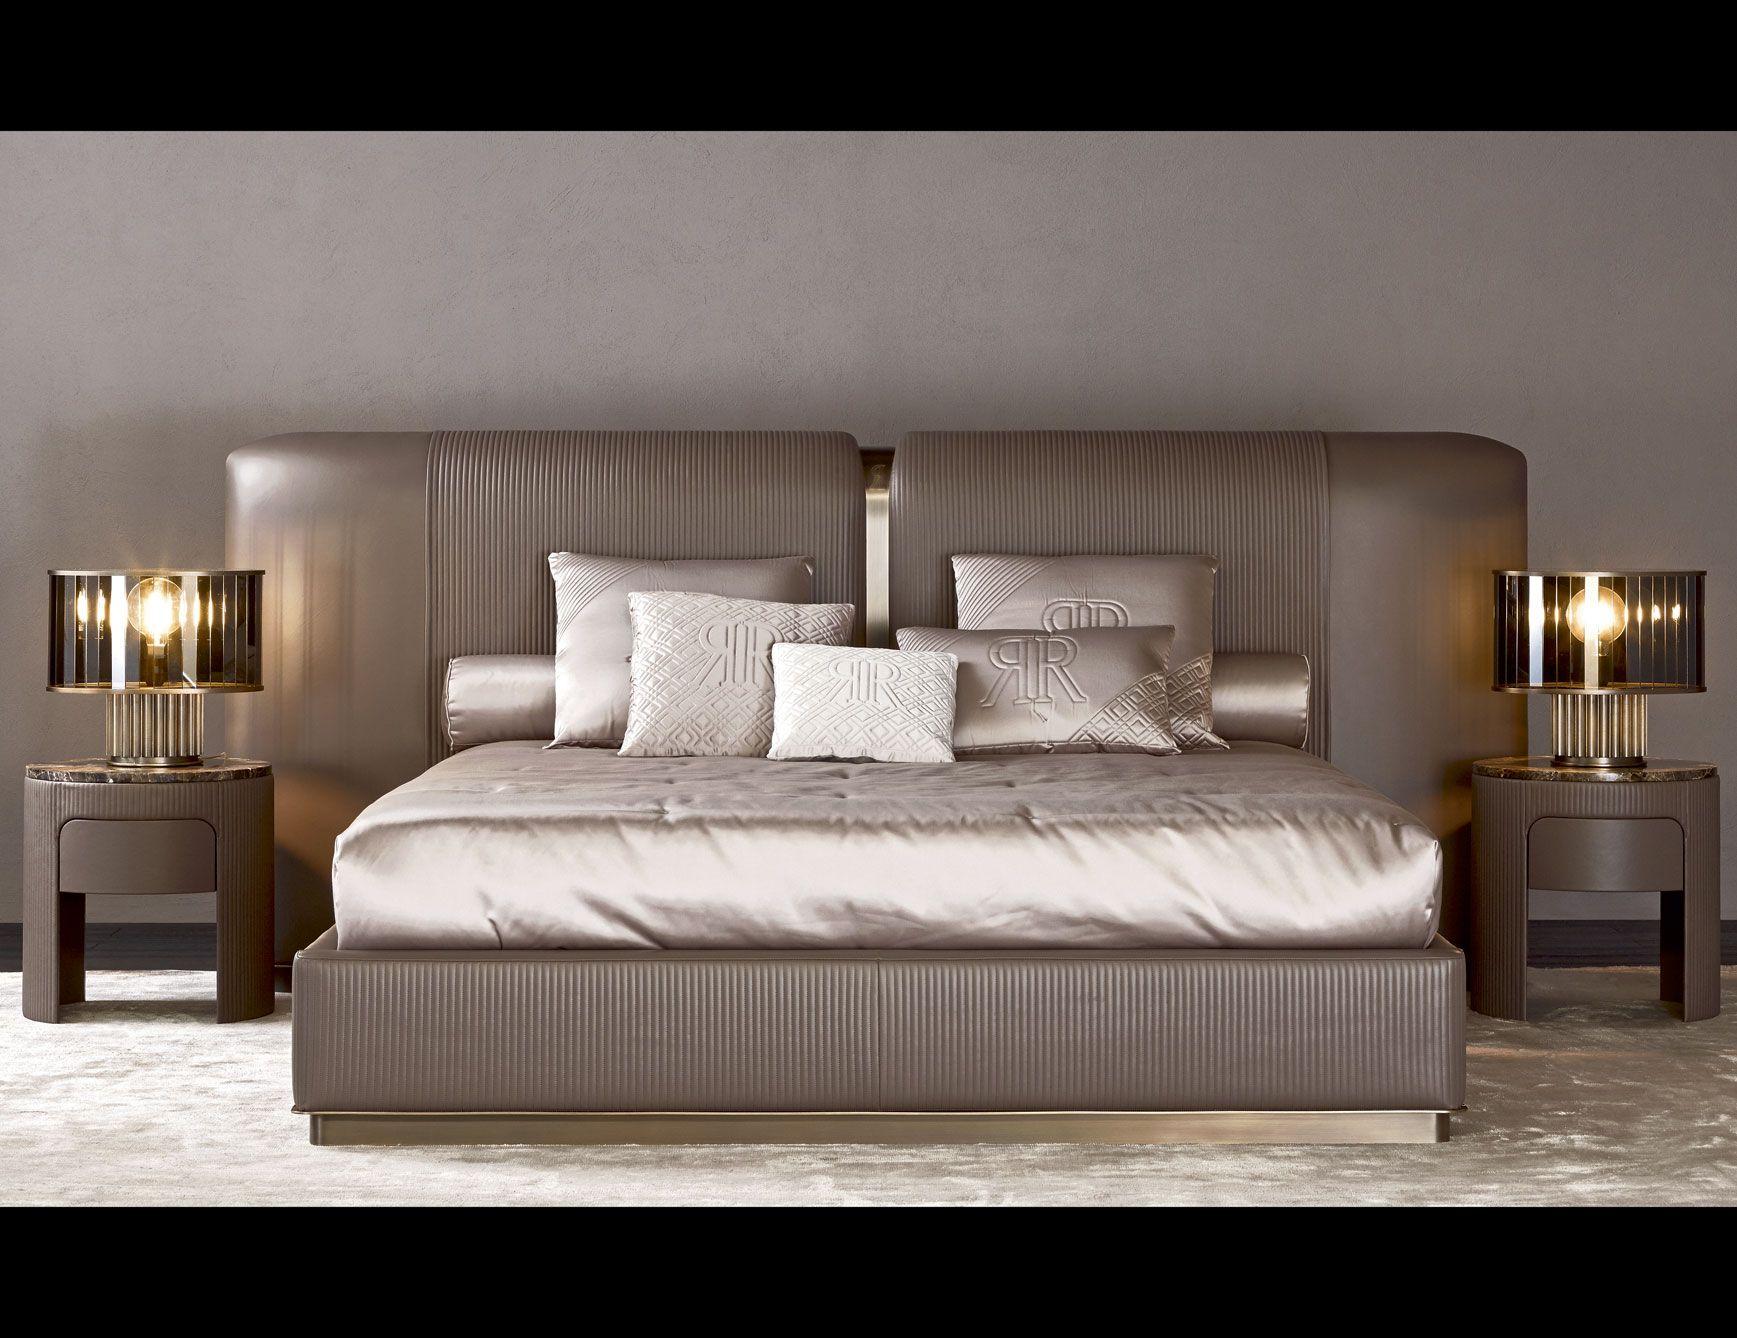 Buying the luxury beds Italian bedroom furniture